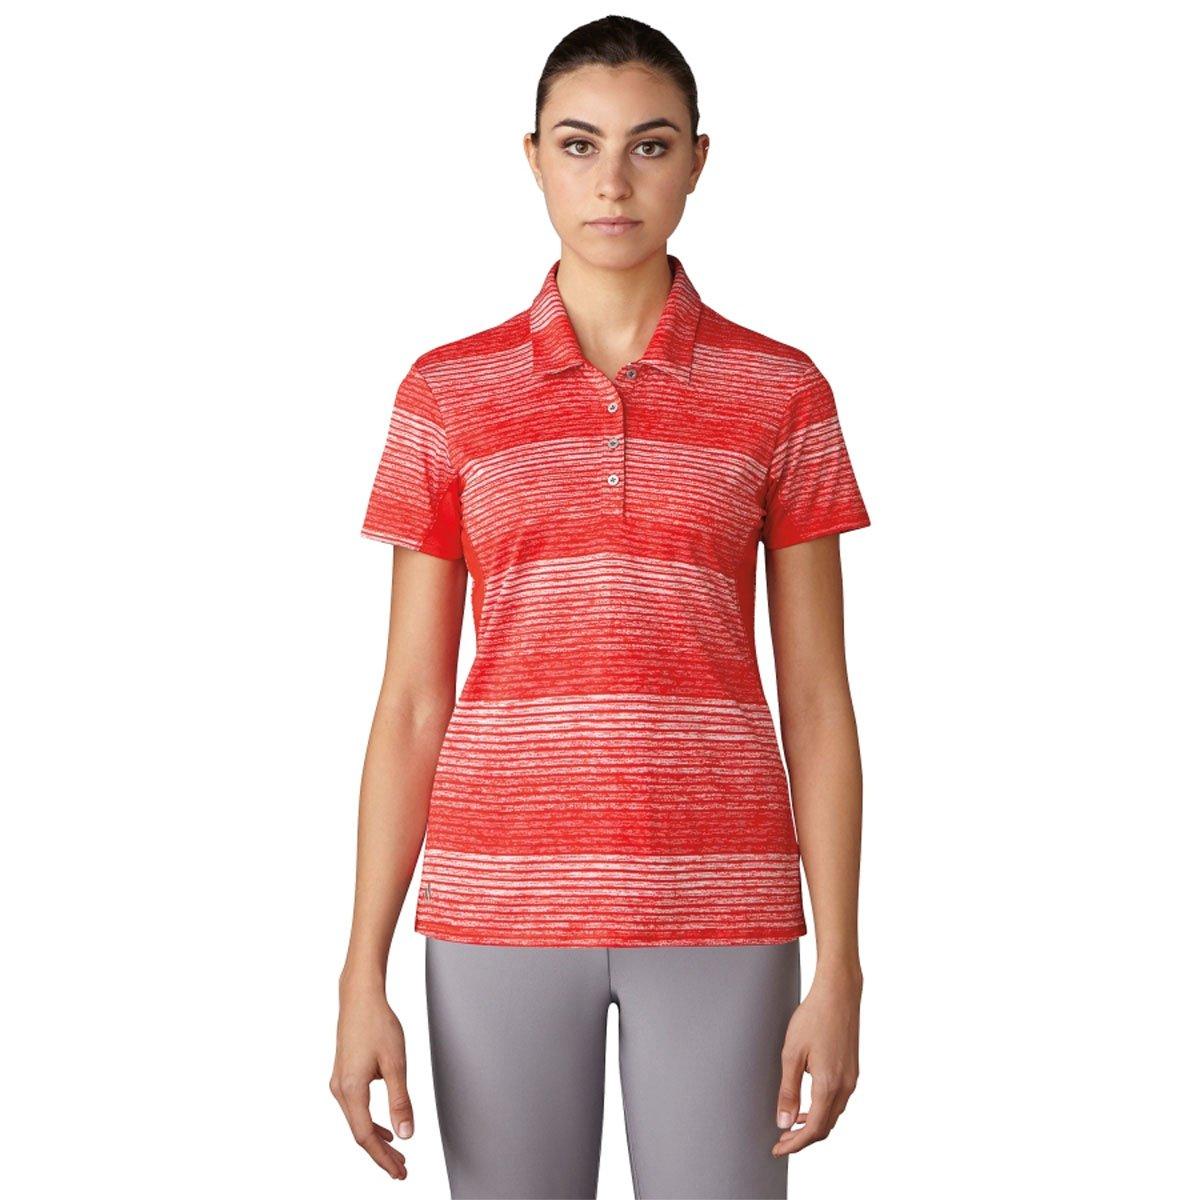 adidas Golf Polo de Manga Corta diseño de Rayas de la Mujer T ...